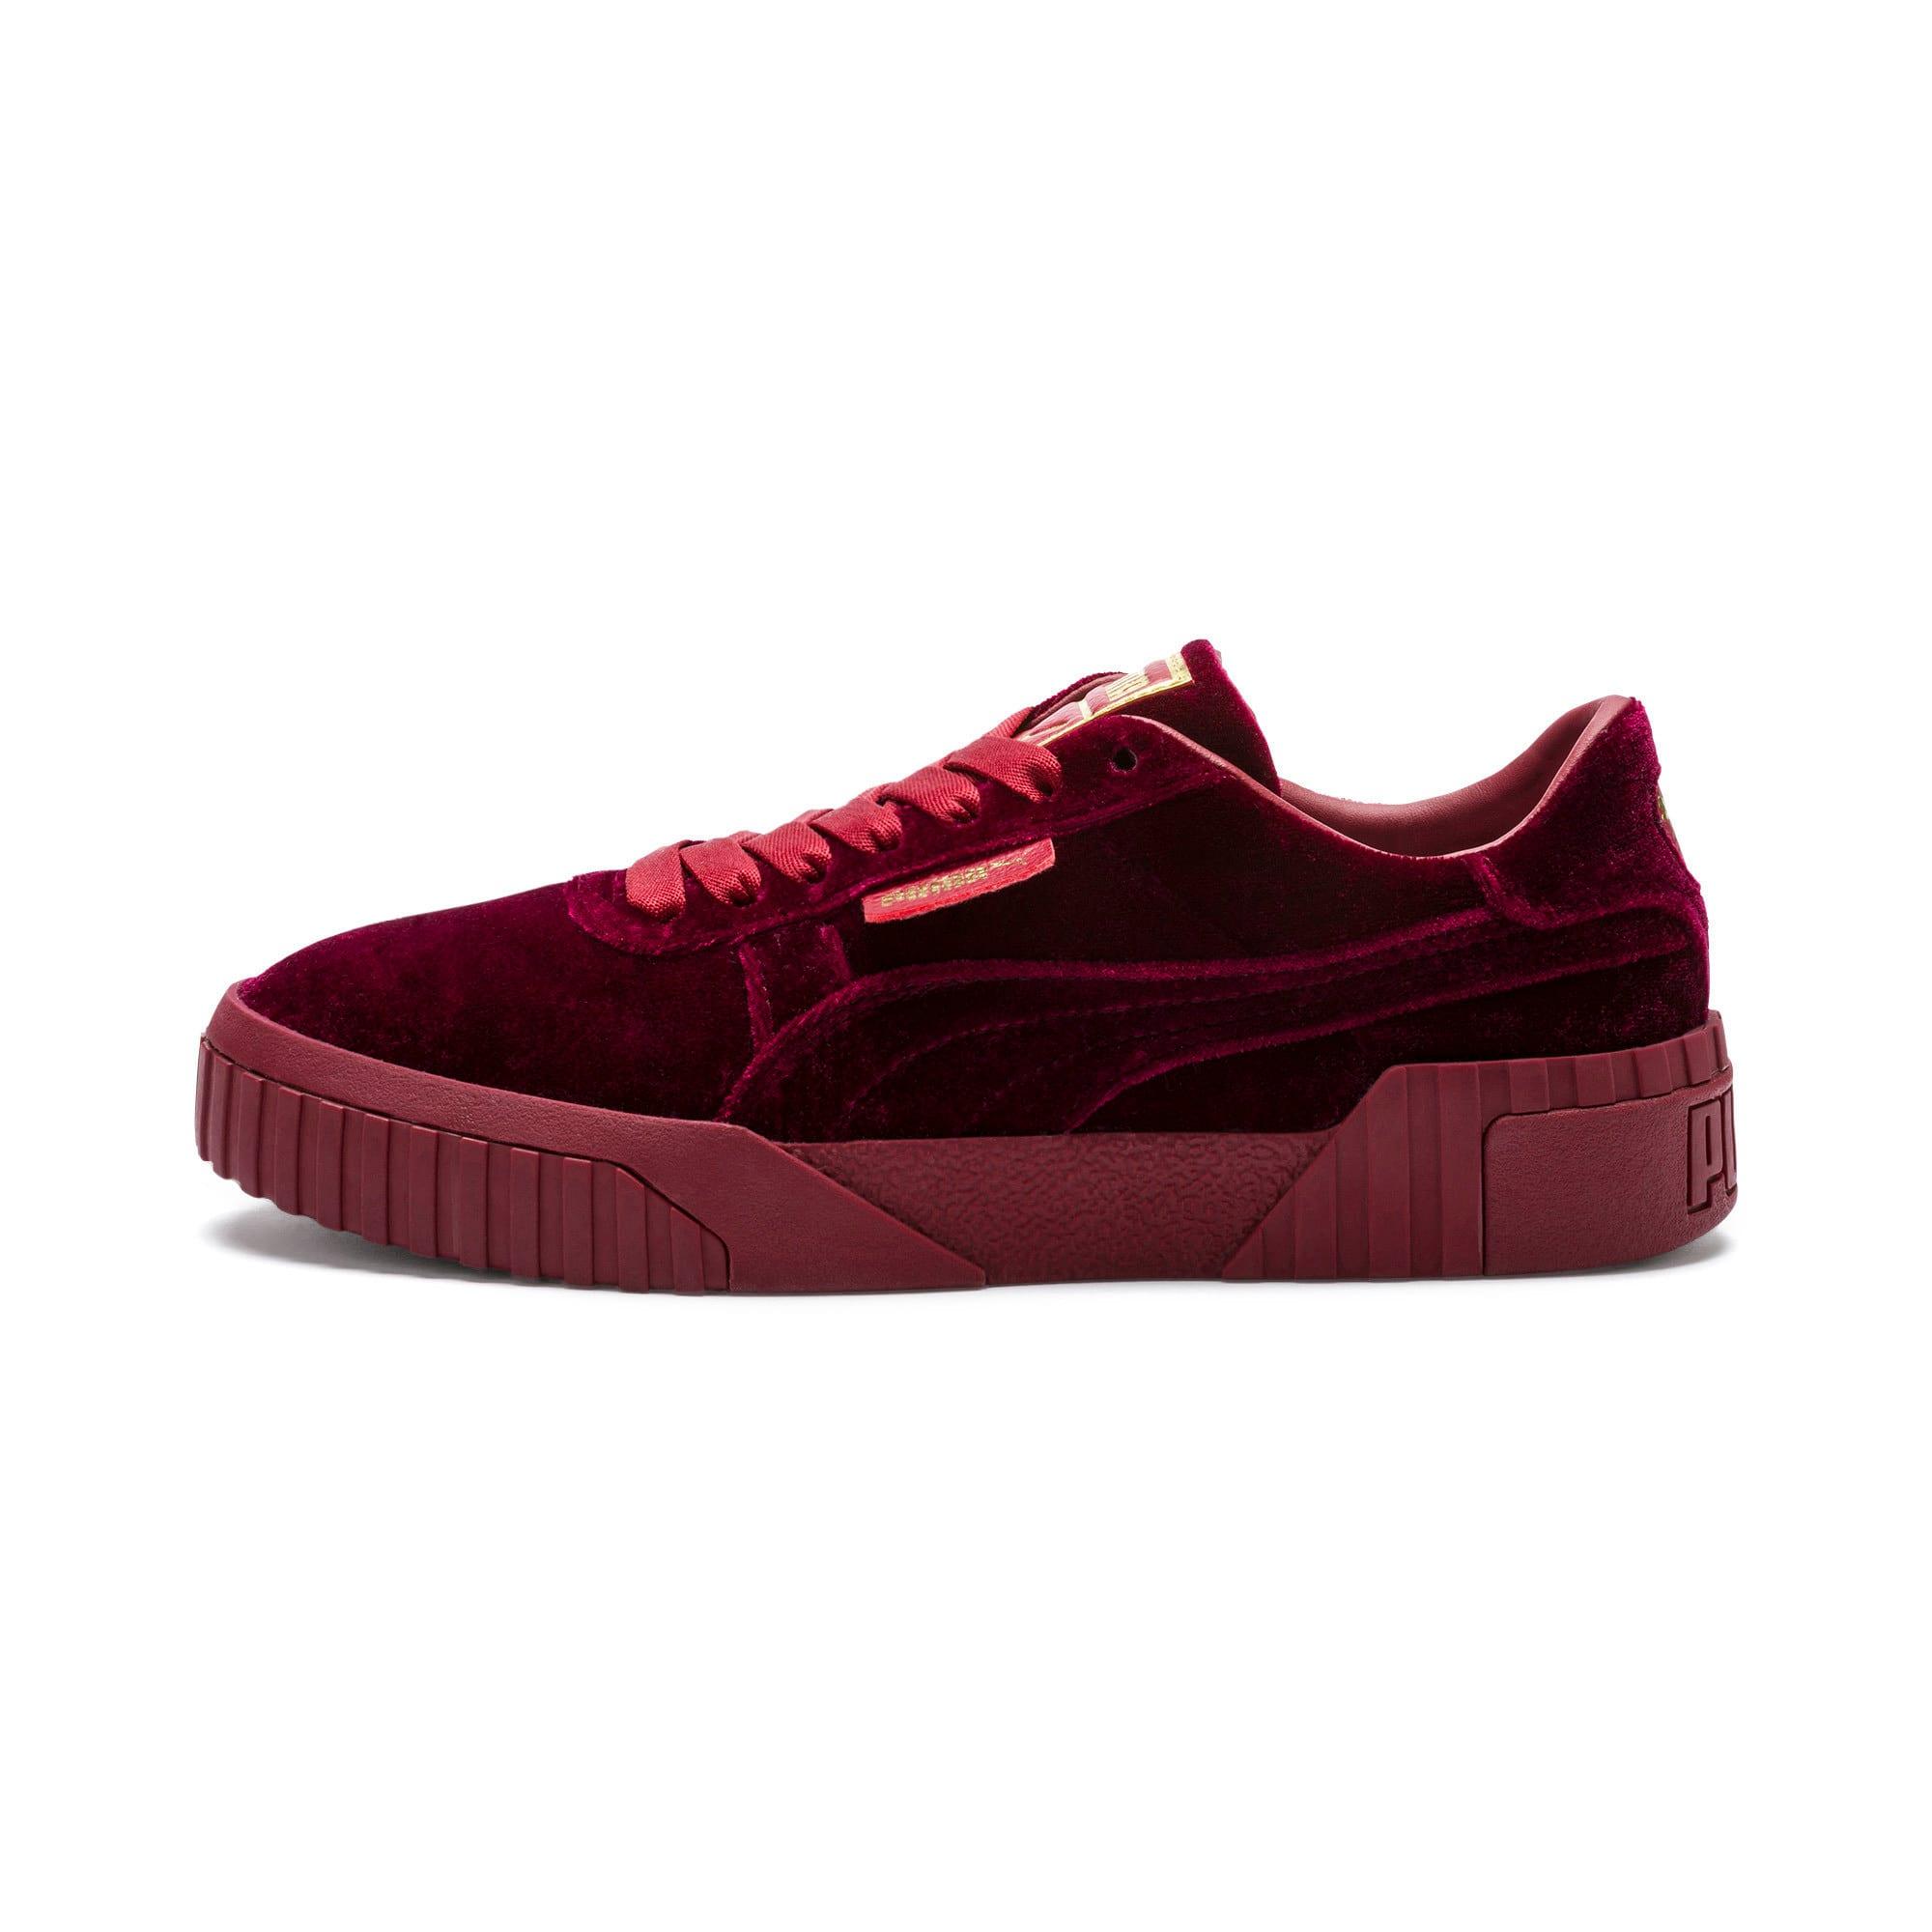 Miniatura 1 de Zapatos deportivosCali Velvetpara mujer, Tibetan Red-Tibetan Red, mediano